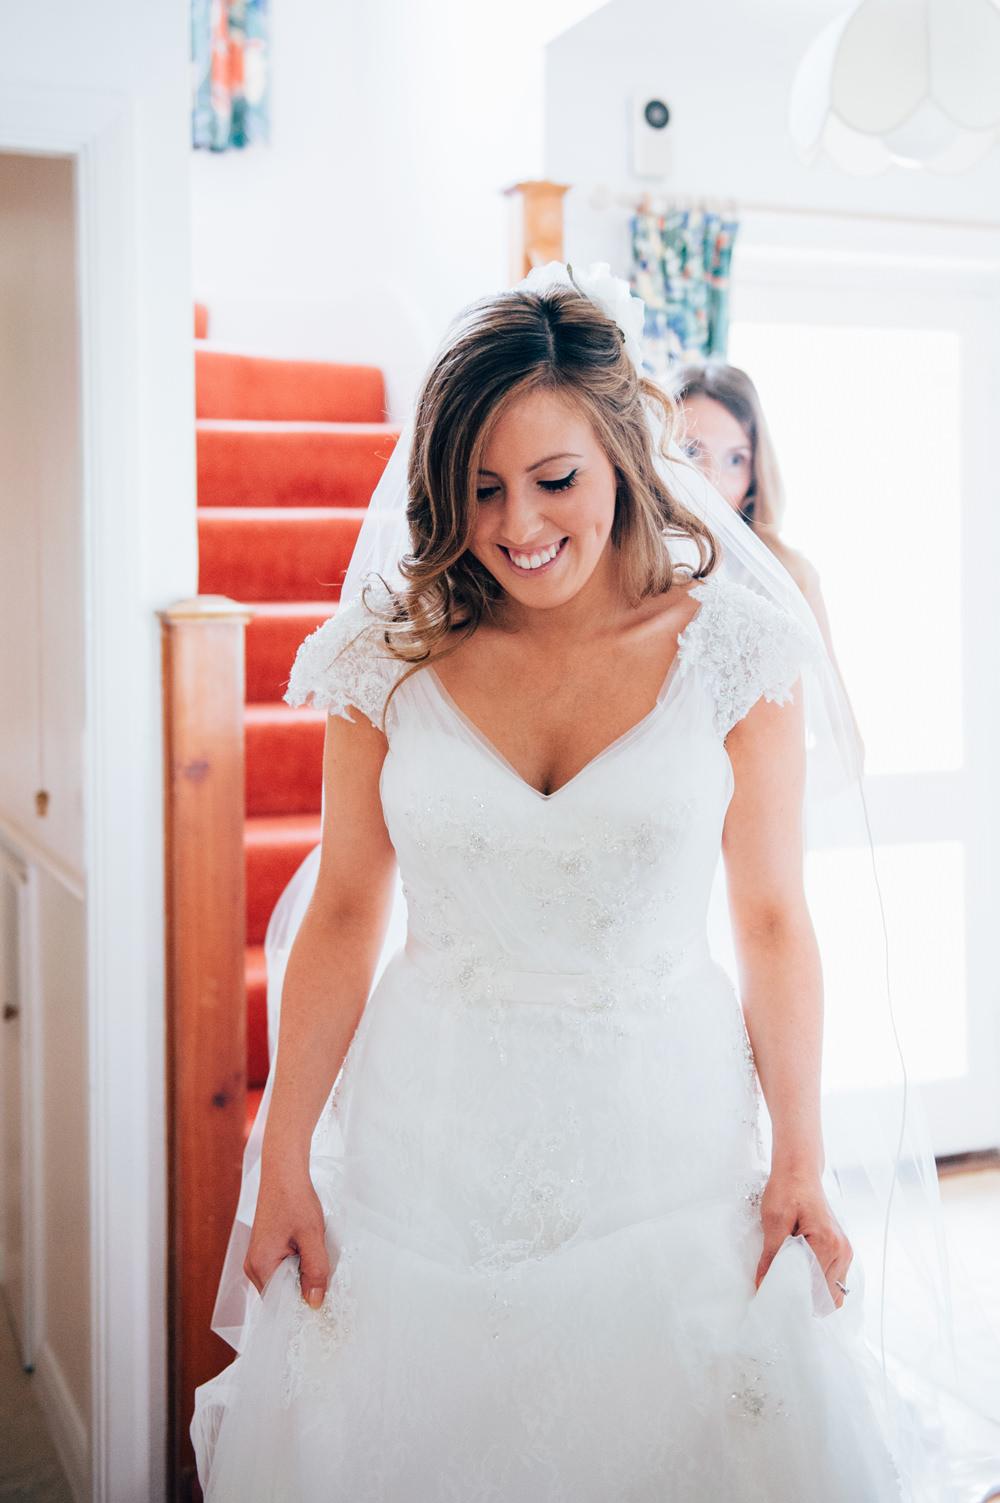 DIY Village Hall Wedding With High Street ASOS Bridesmaid Dresses